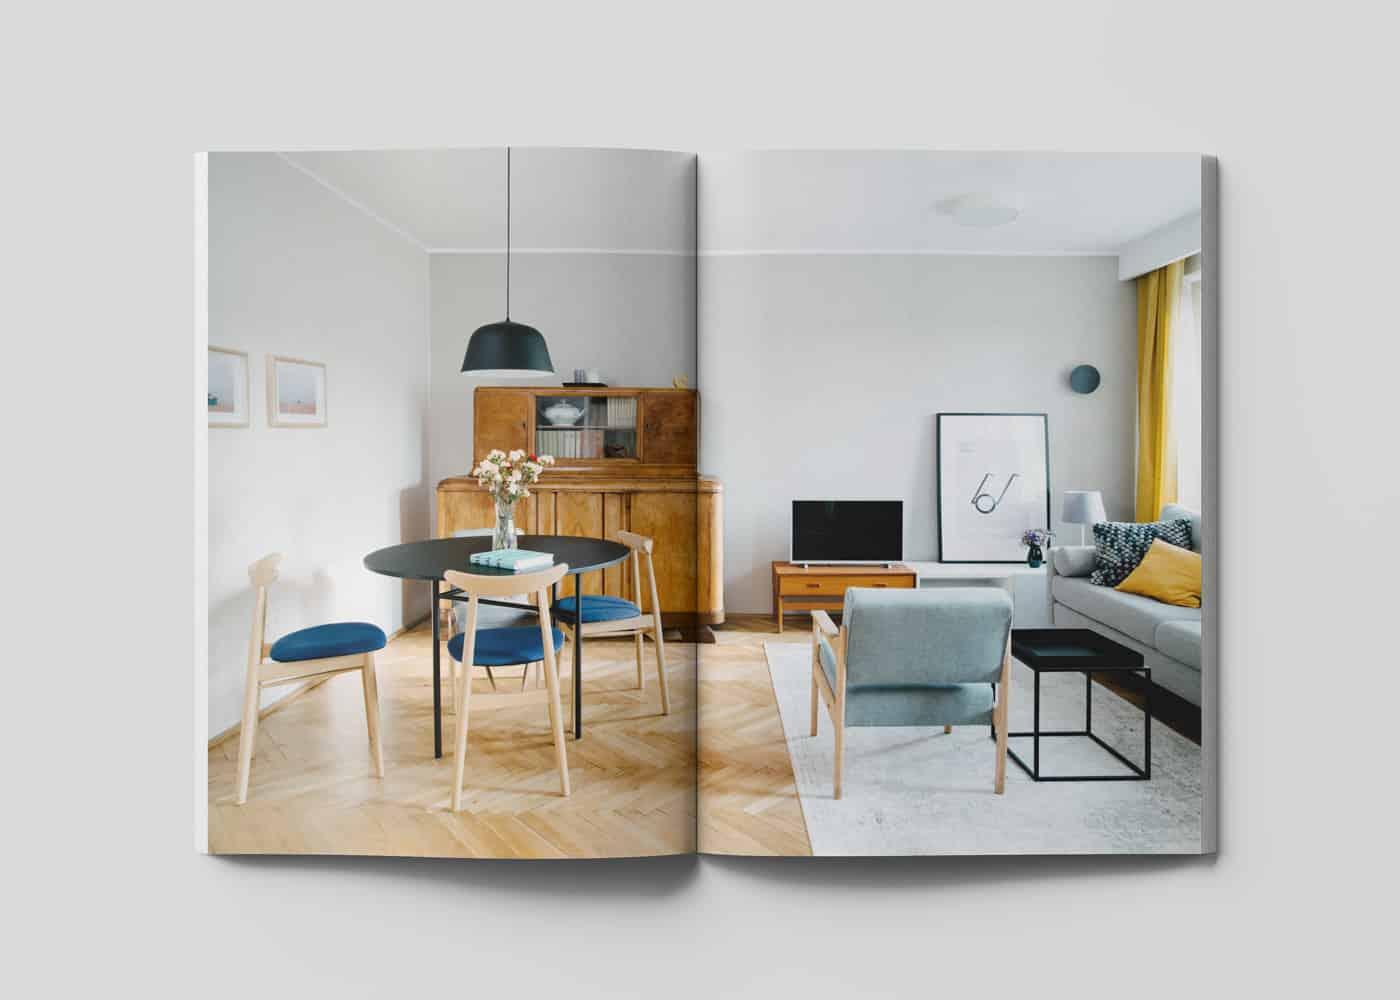 Wladyslawa IV Apartment for Studio PLAN A